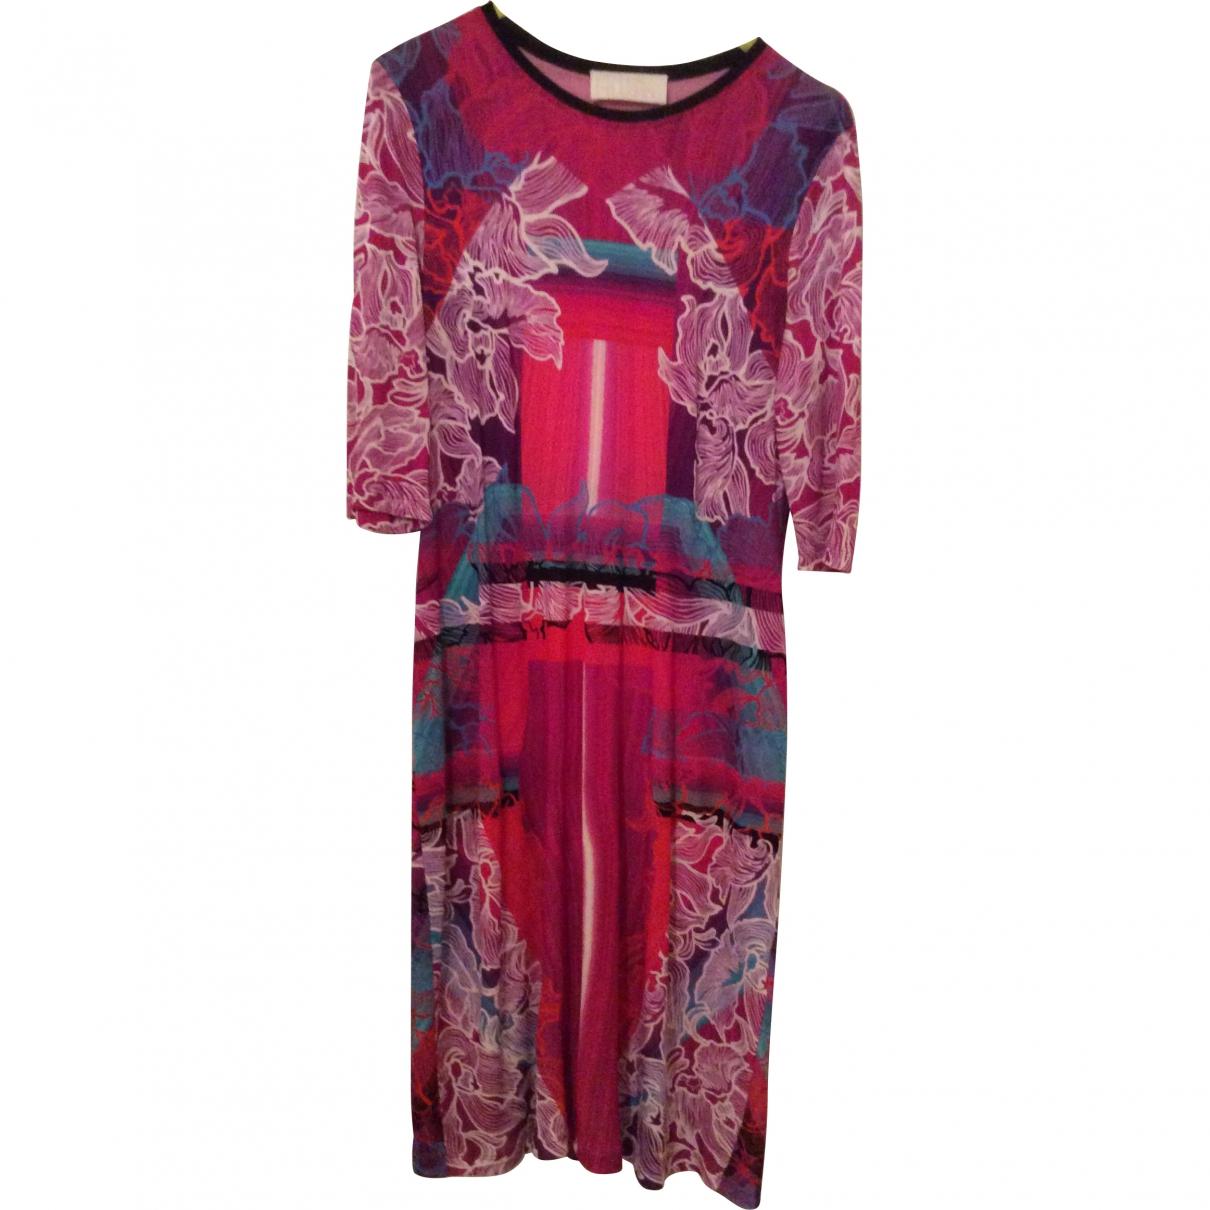 Peter Pilotto \N Multicolour dress for Women 14 UK